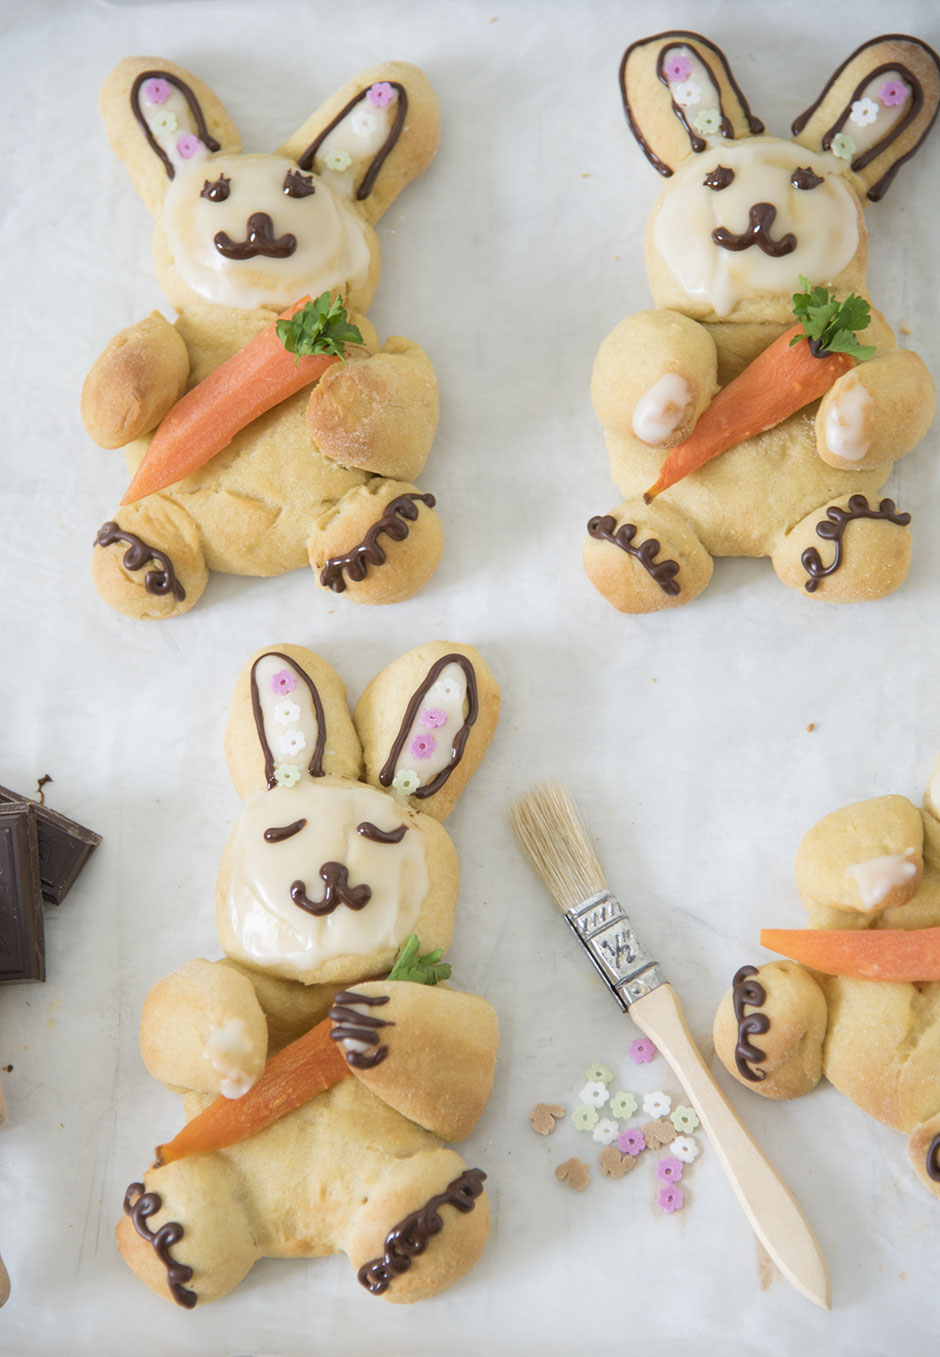 Süßes Quarkgebäck zu Ostern vegan